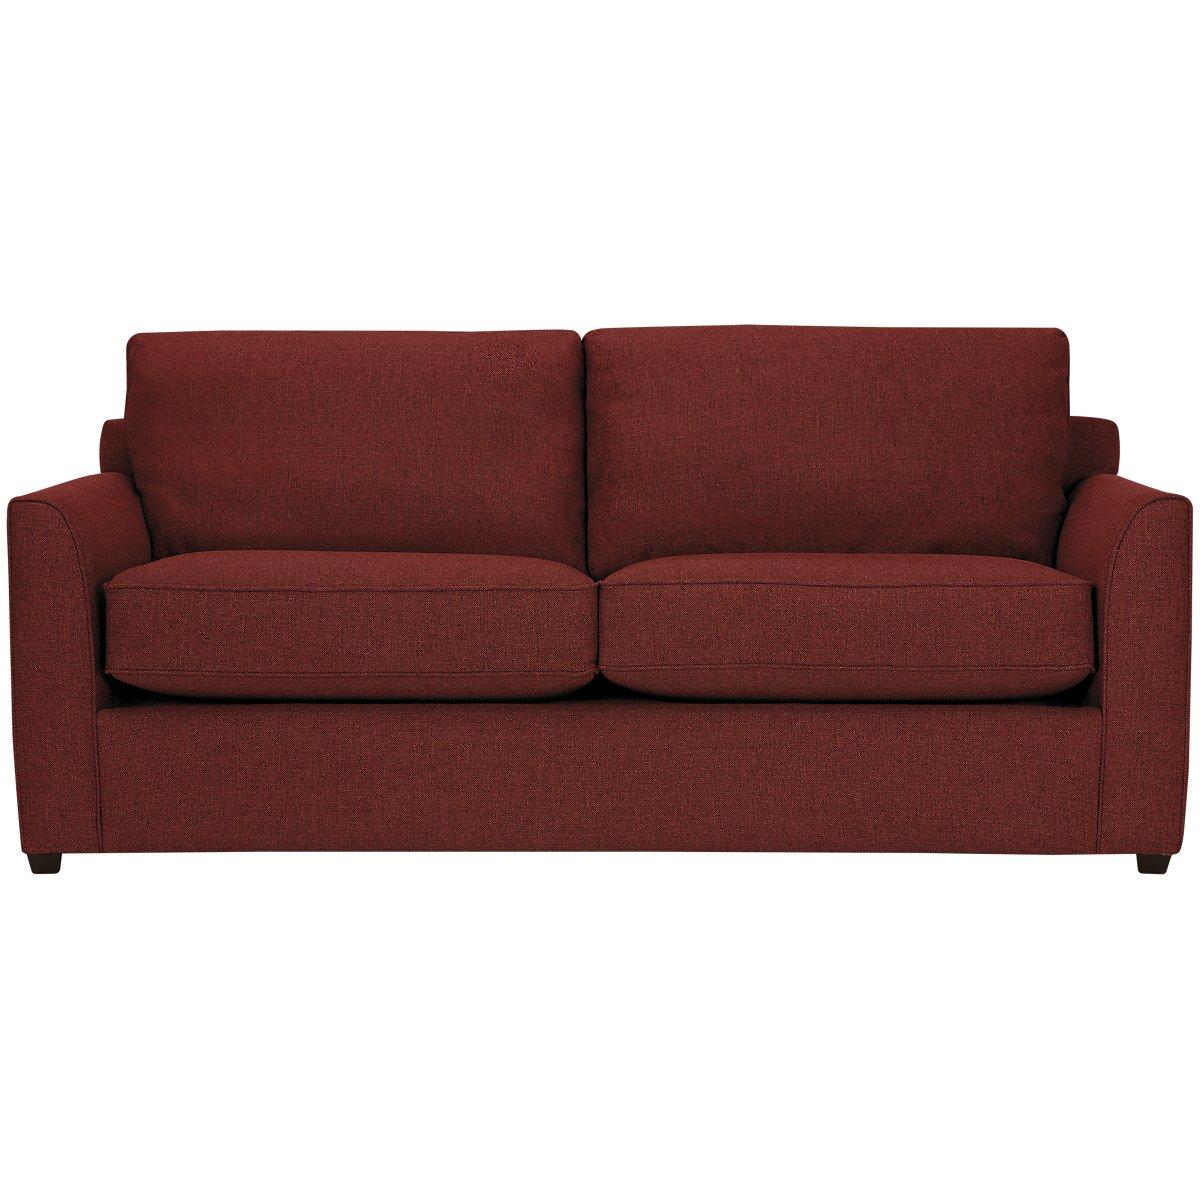 Red fabric sofa divani casa tejon modern red fabric sofa for Sofa bed red